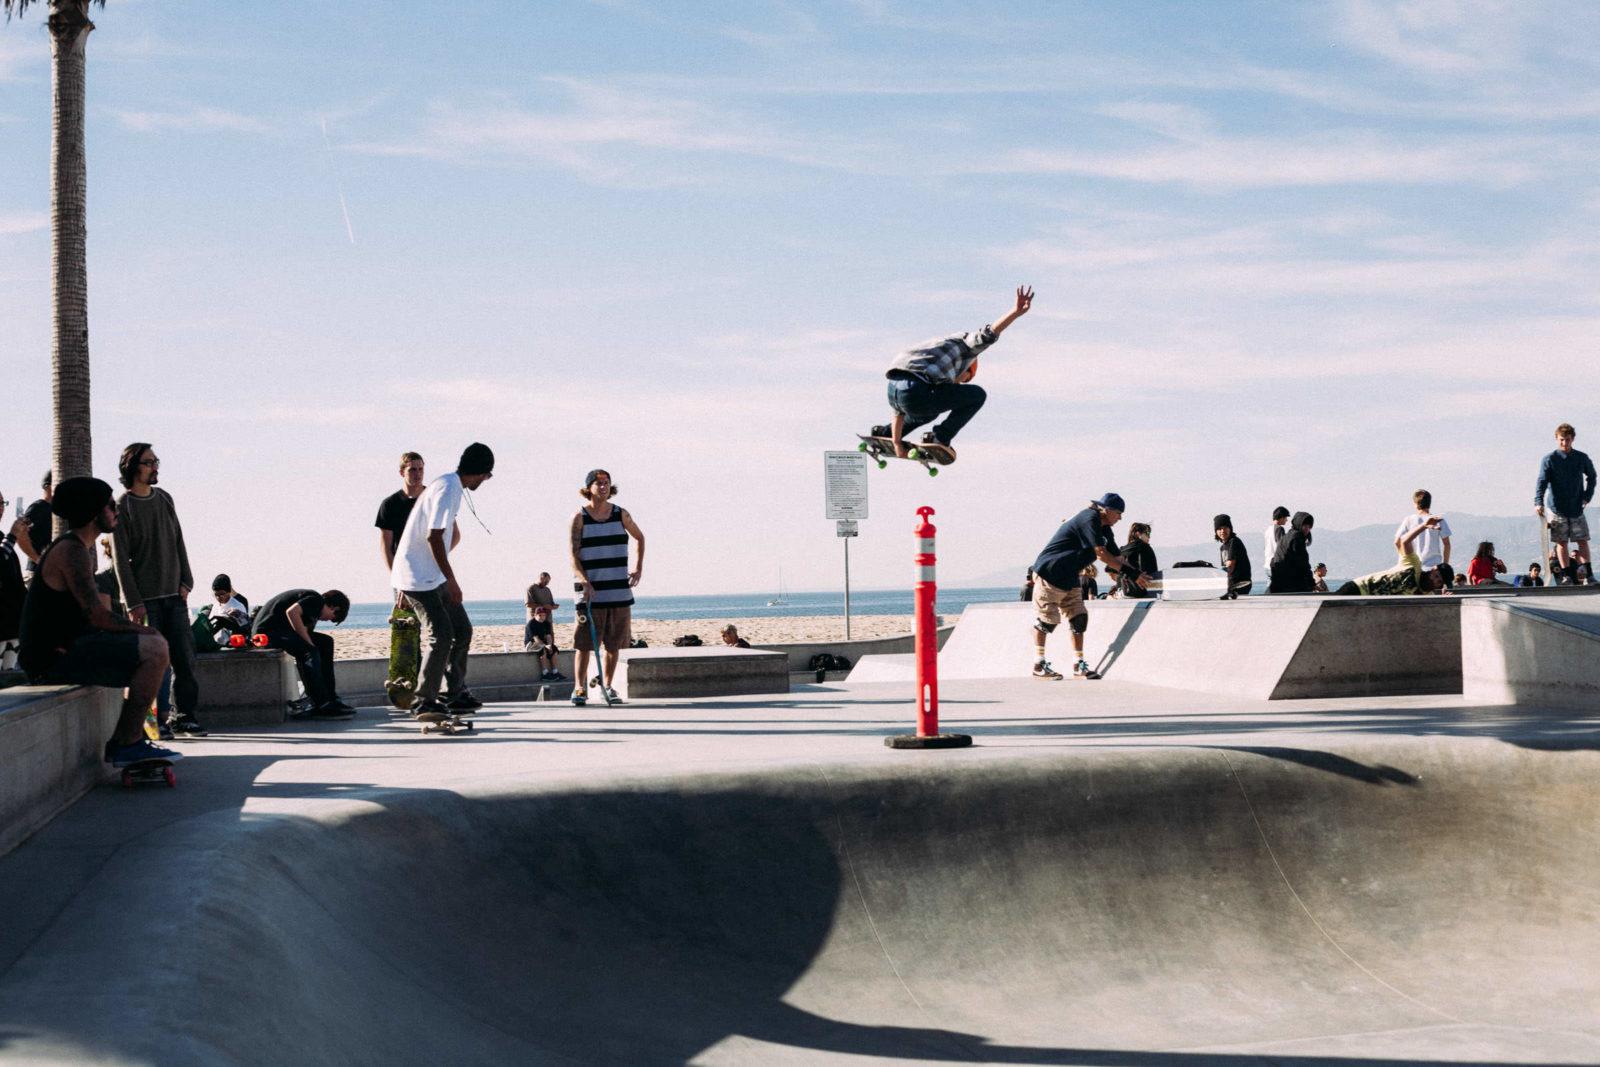 Claus M. Morgenstern Exhibitions Venice Skate